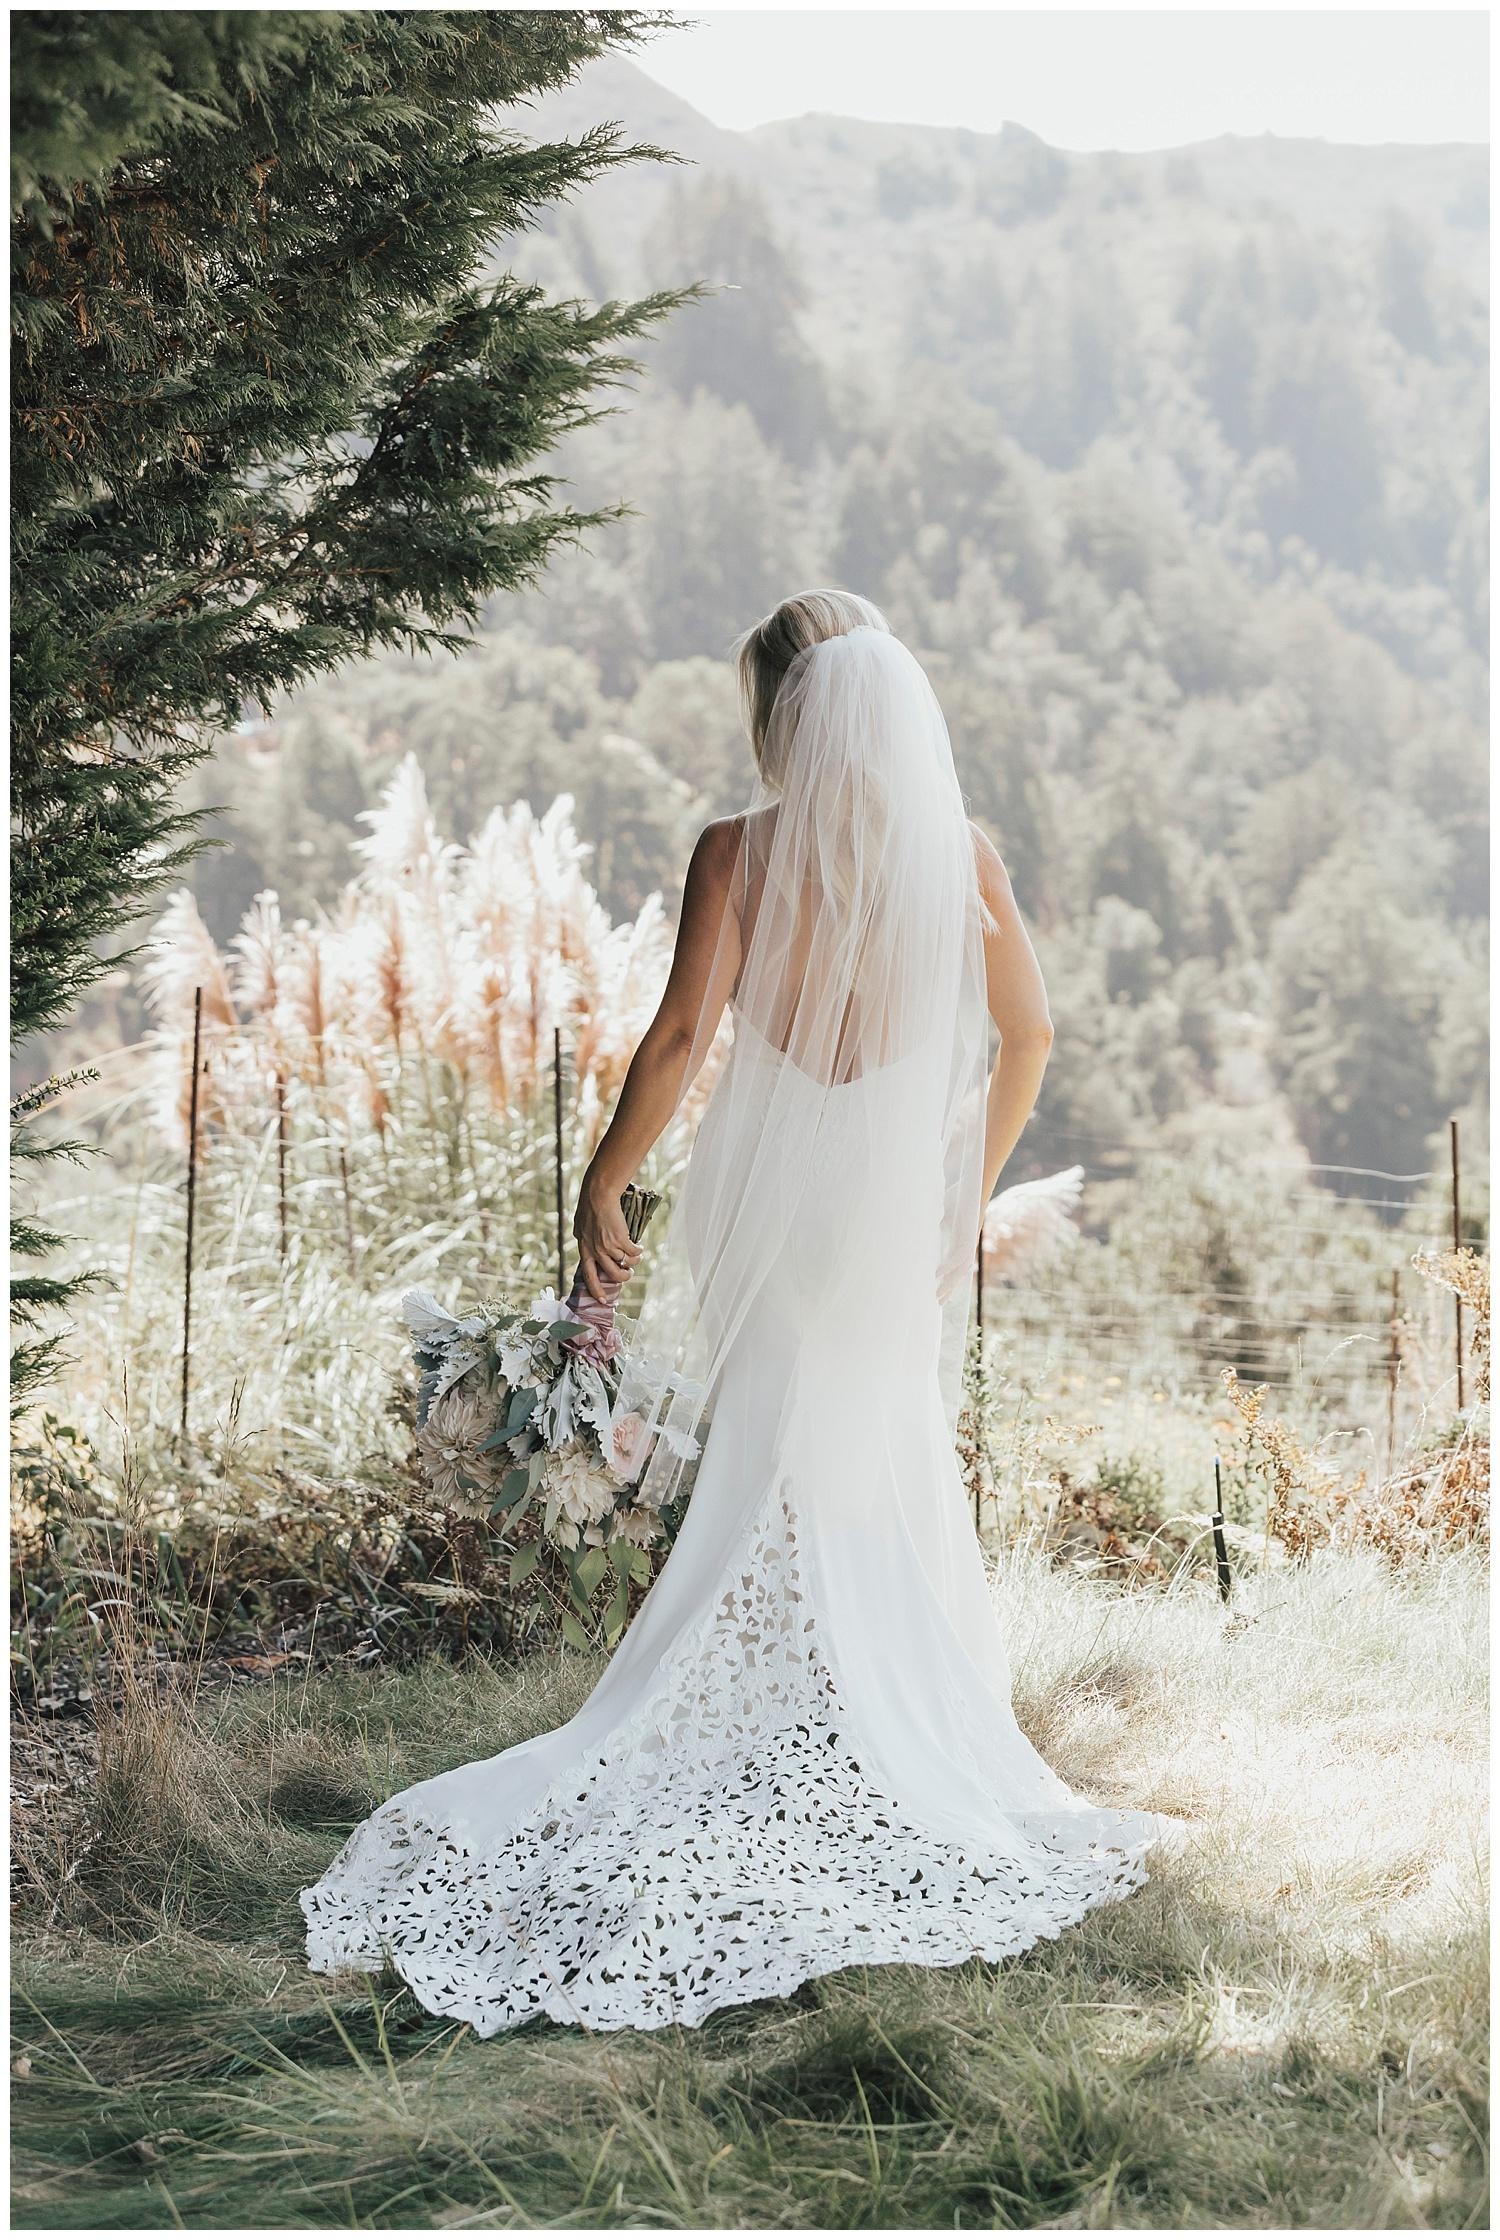 big-sur-wedding-ridley-watters-gown-carol-oliva-photography.jpg